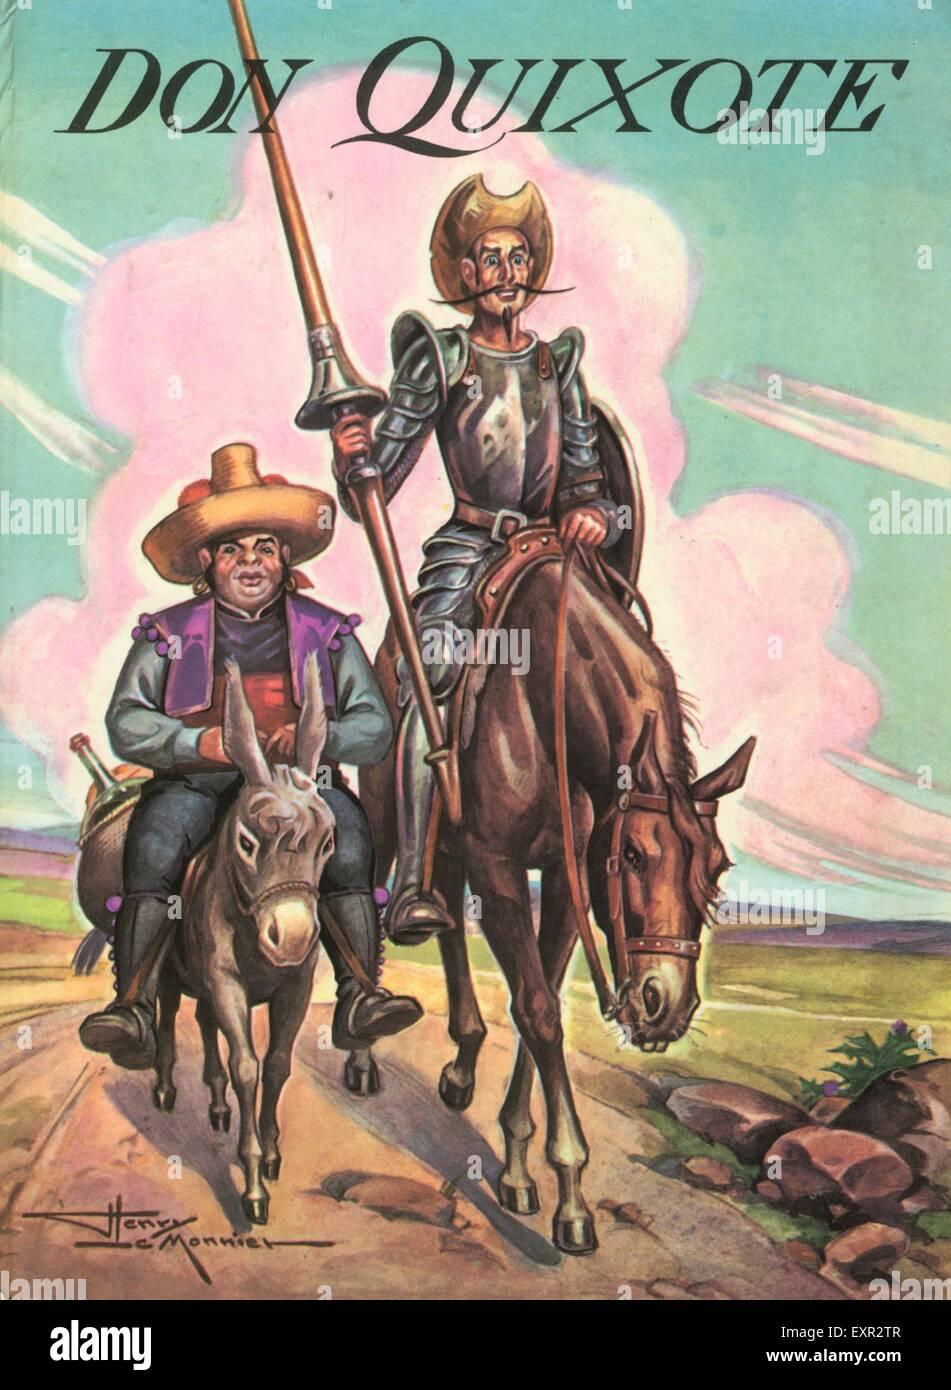 1970s UK Don Quixote Book Cover - Stock Image